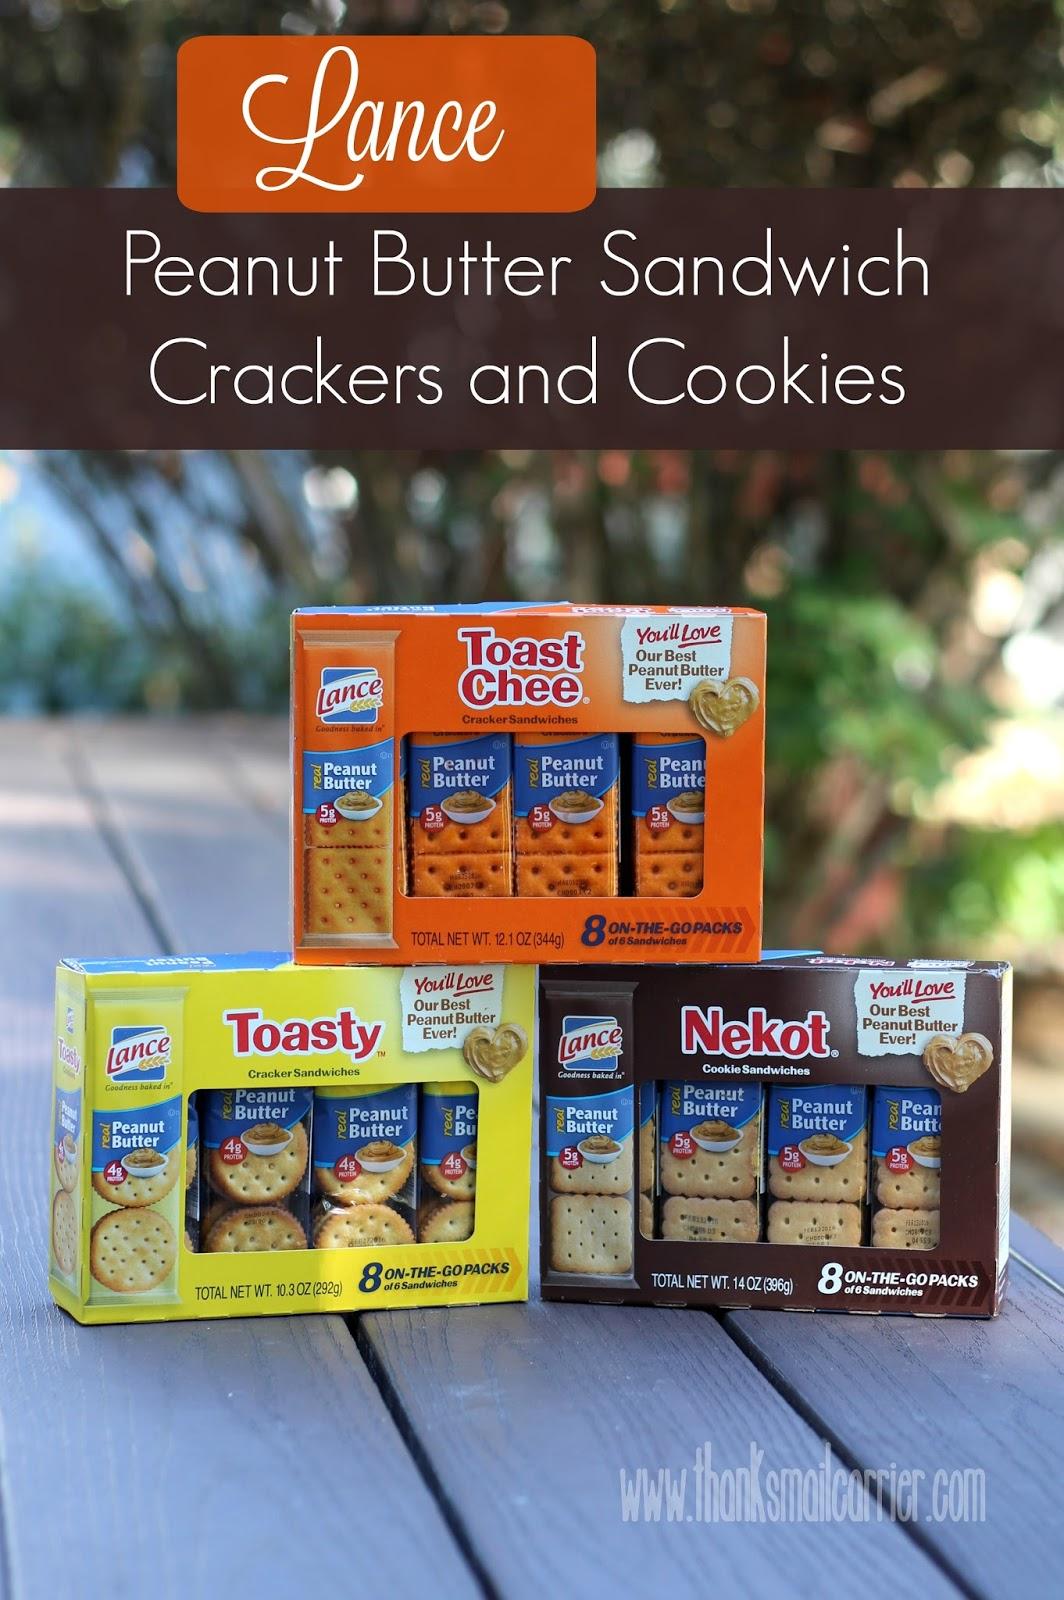 Lance Peanut Butter snacks